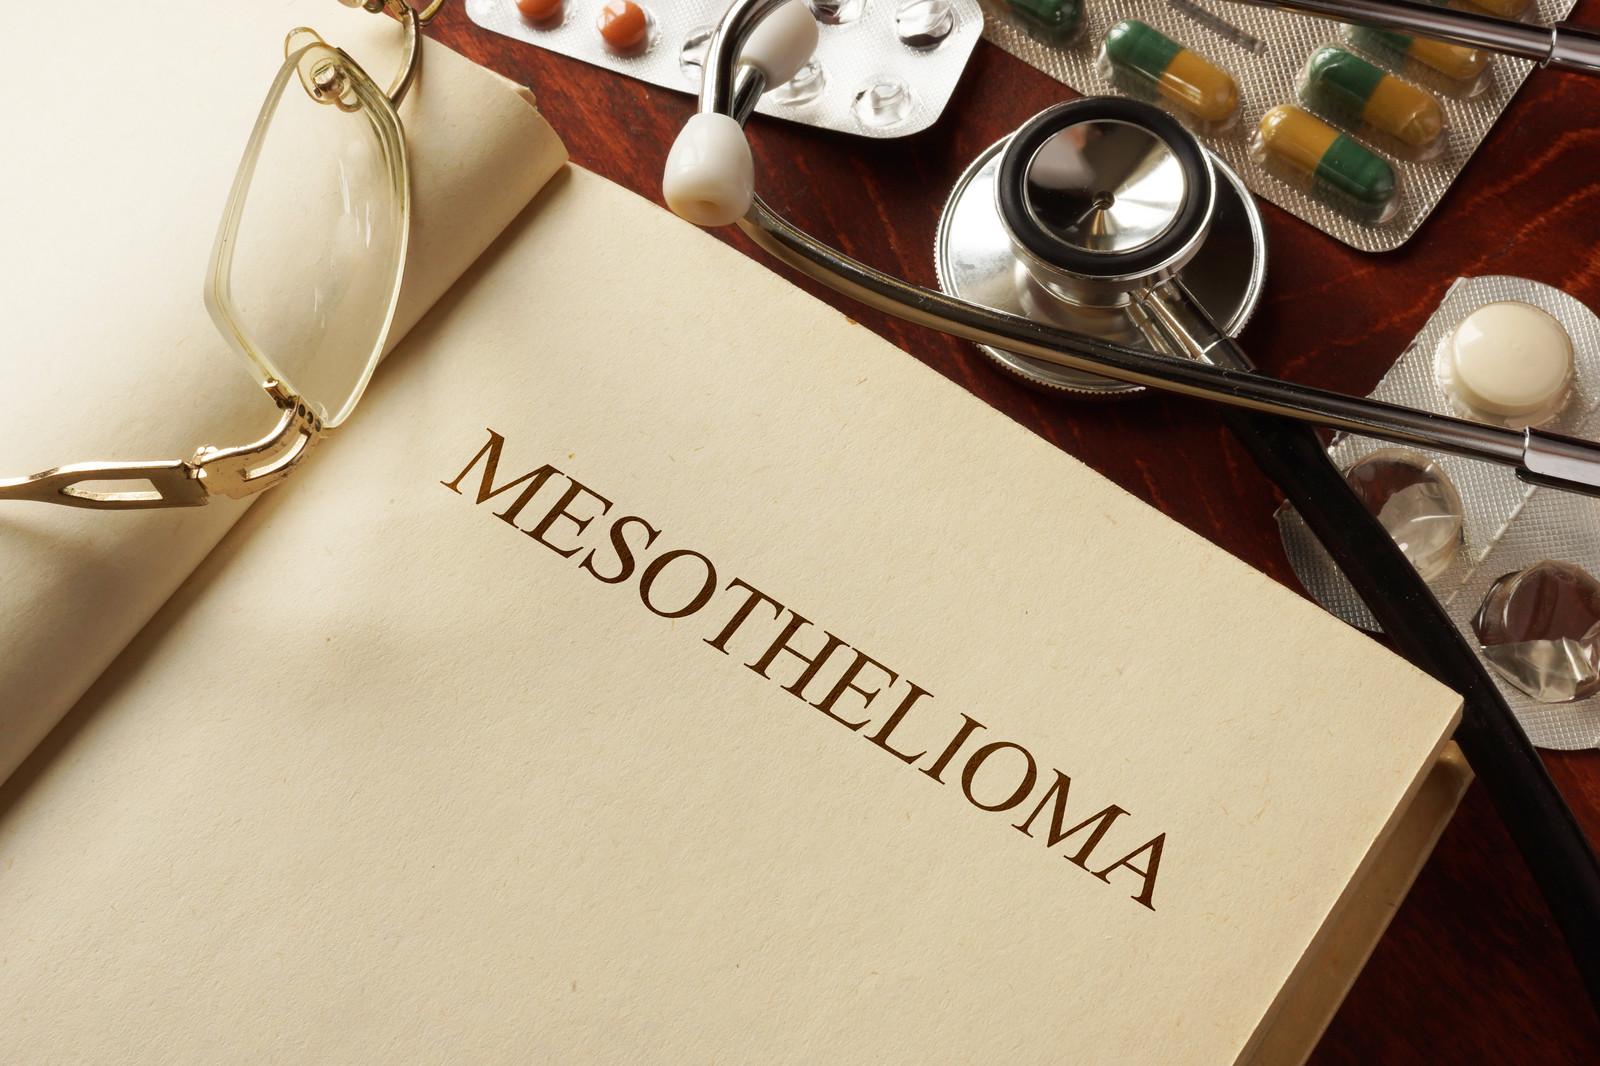 Mesothelioma lawsuit - Mesothelioma Lawsuit 9